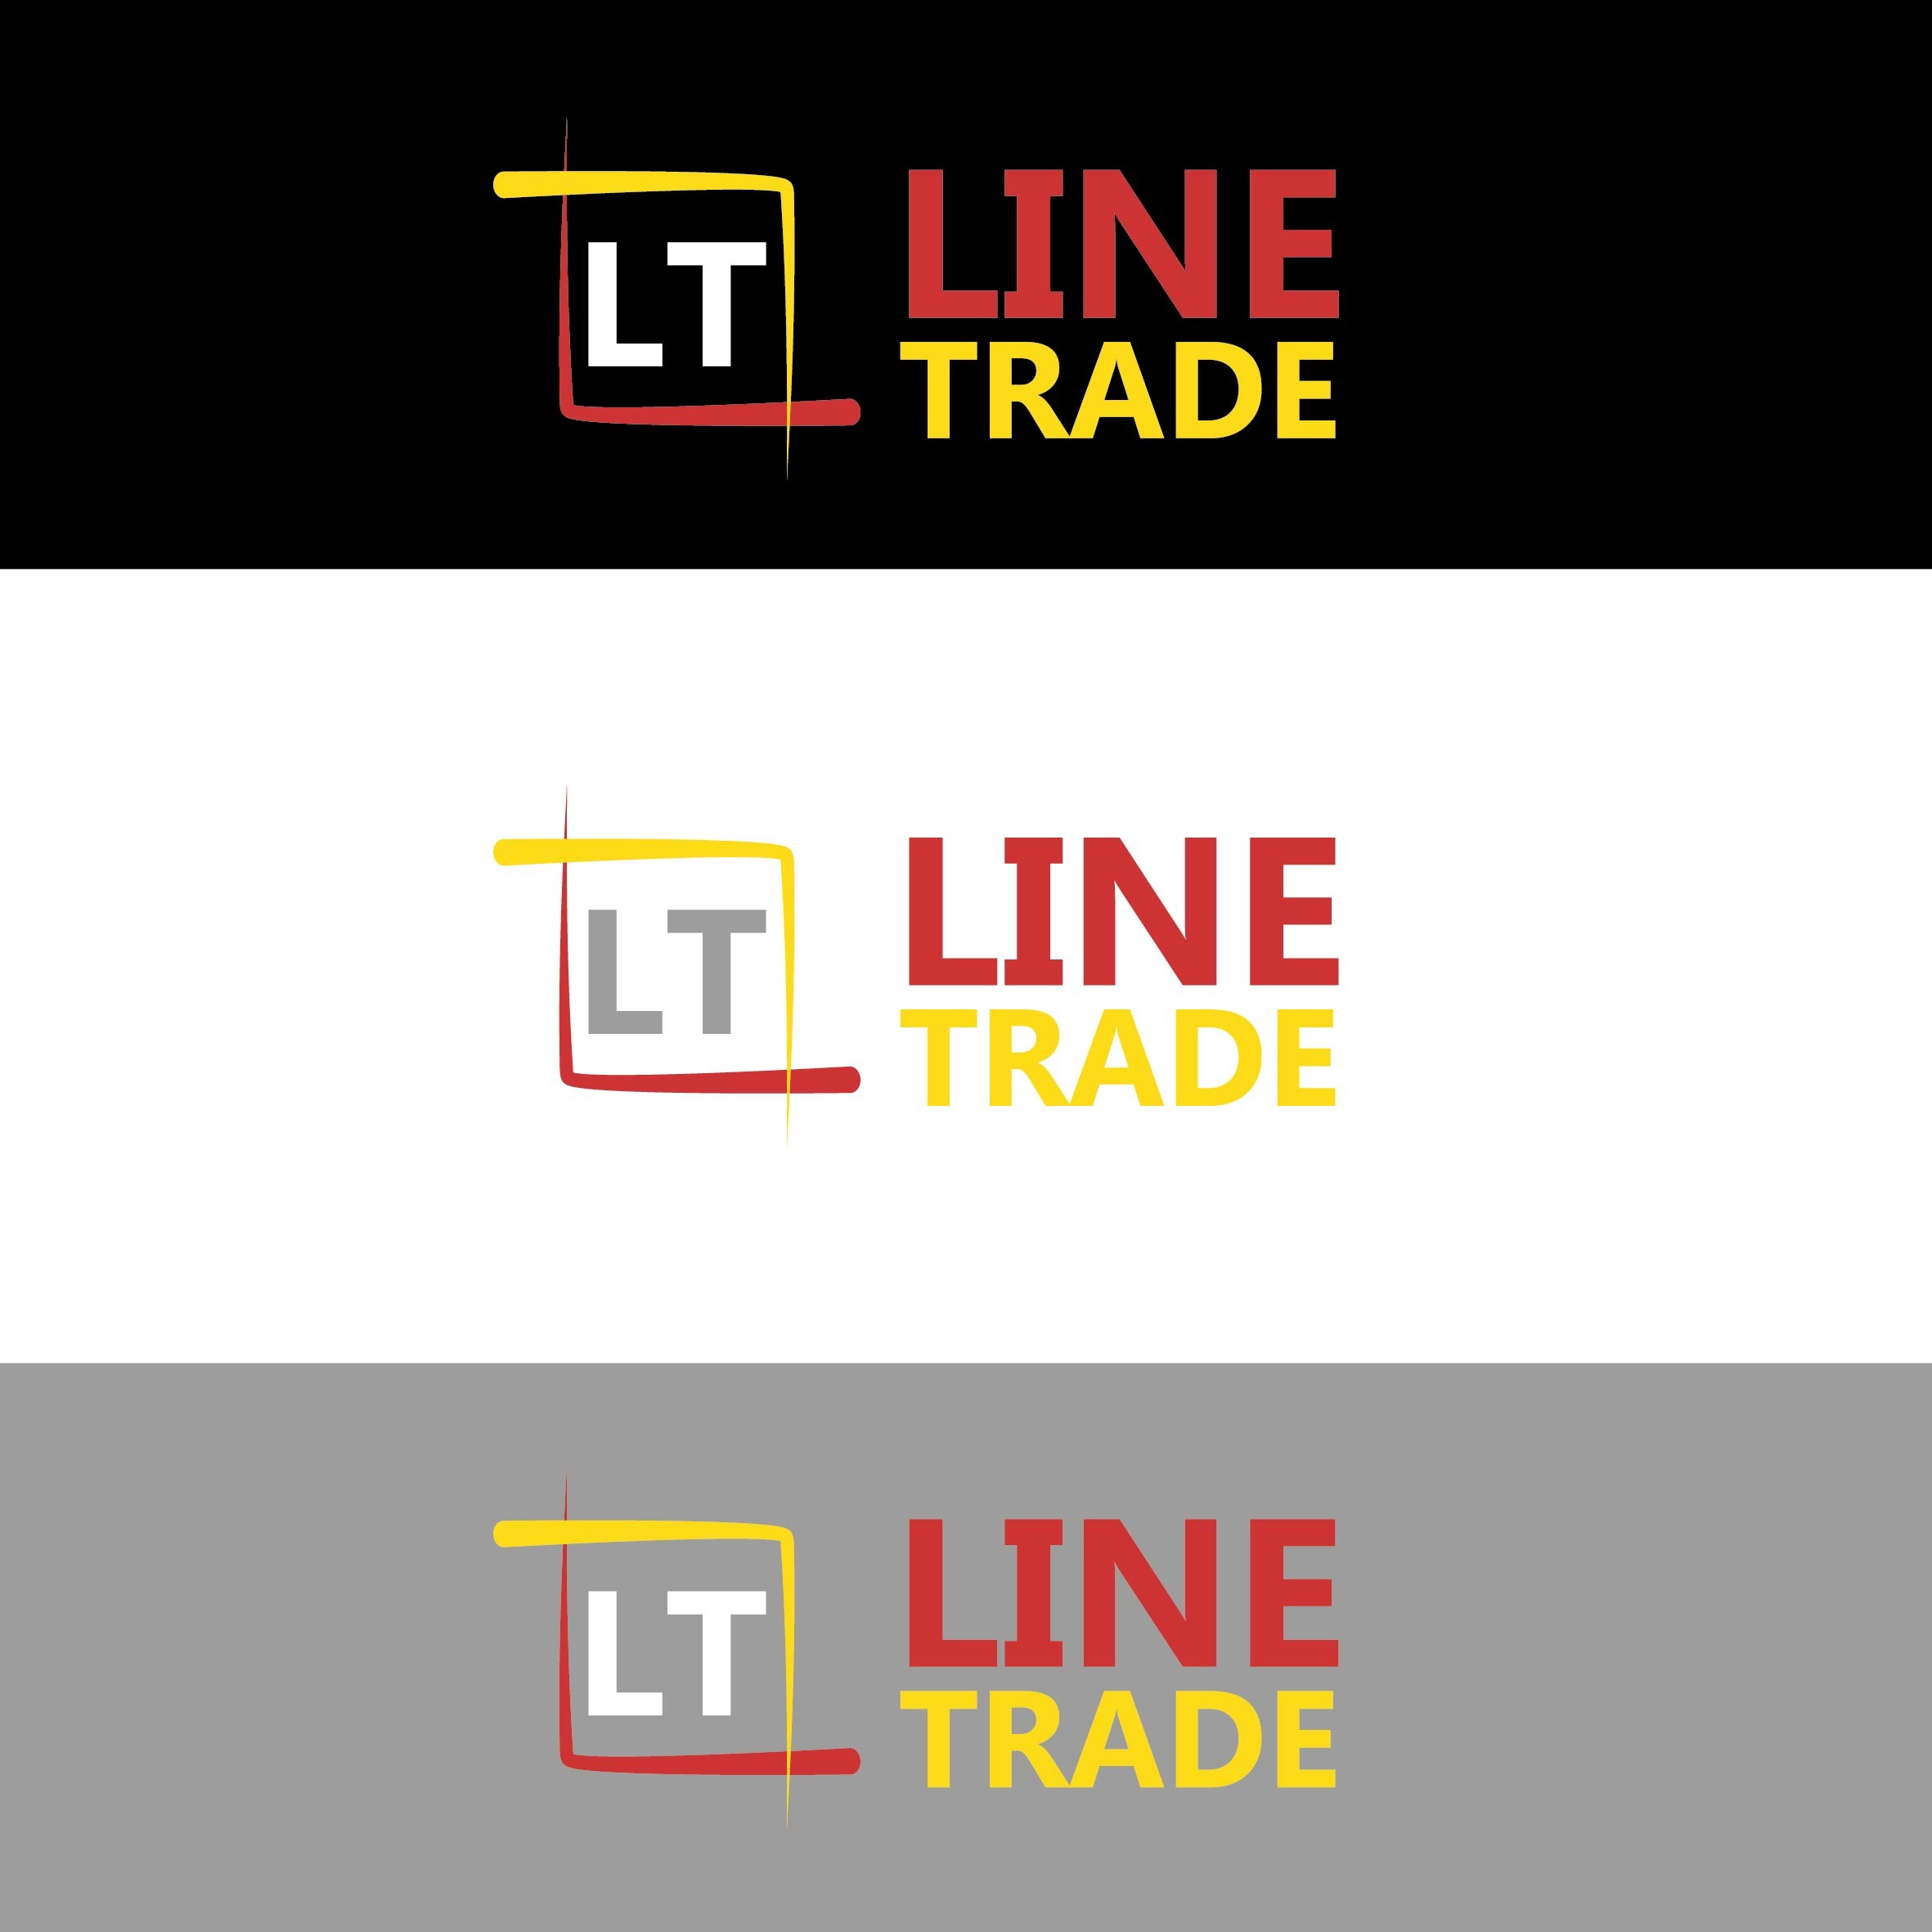 Разработка логотипа компании Line Trade фото f_22150f7ecdd3d871.jpg